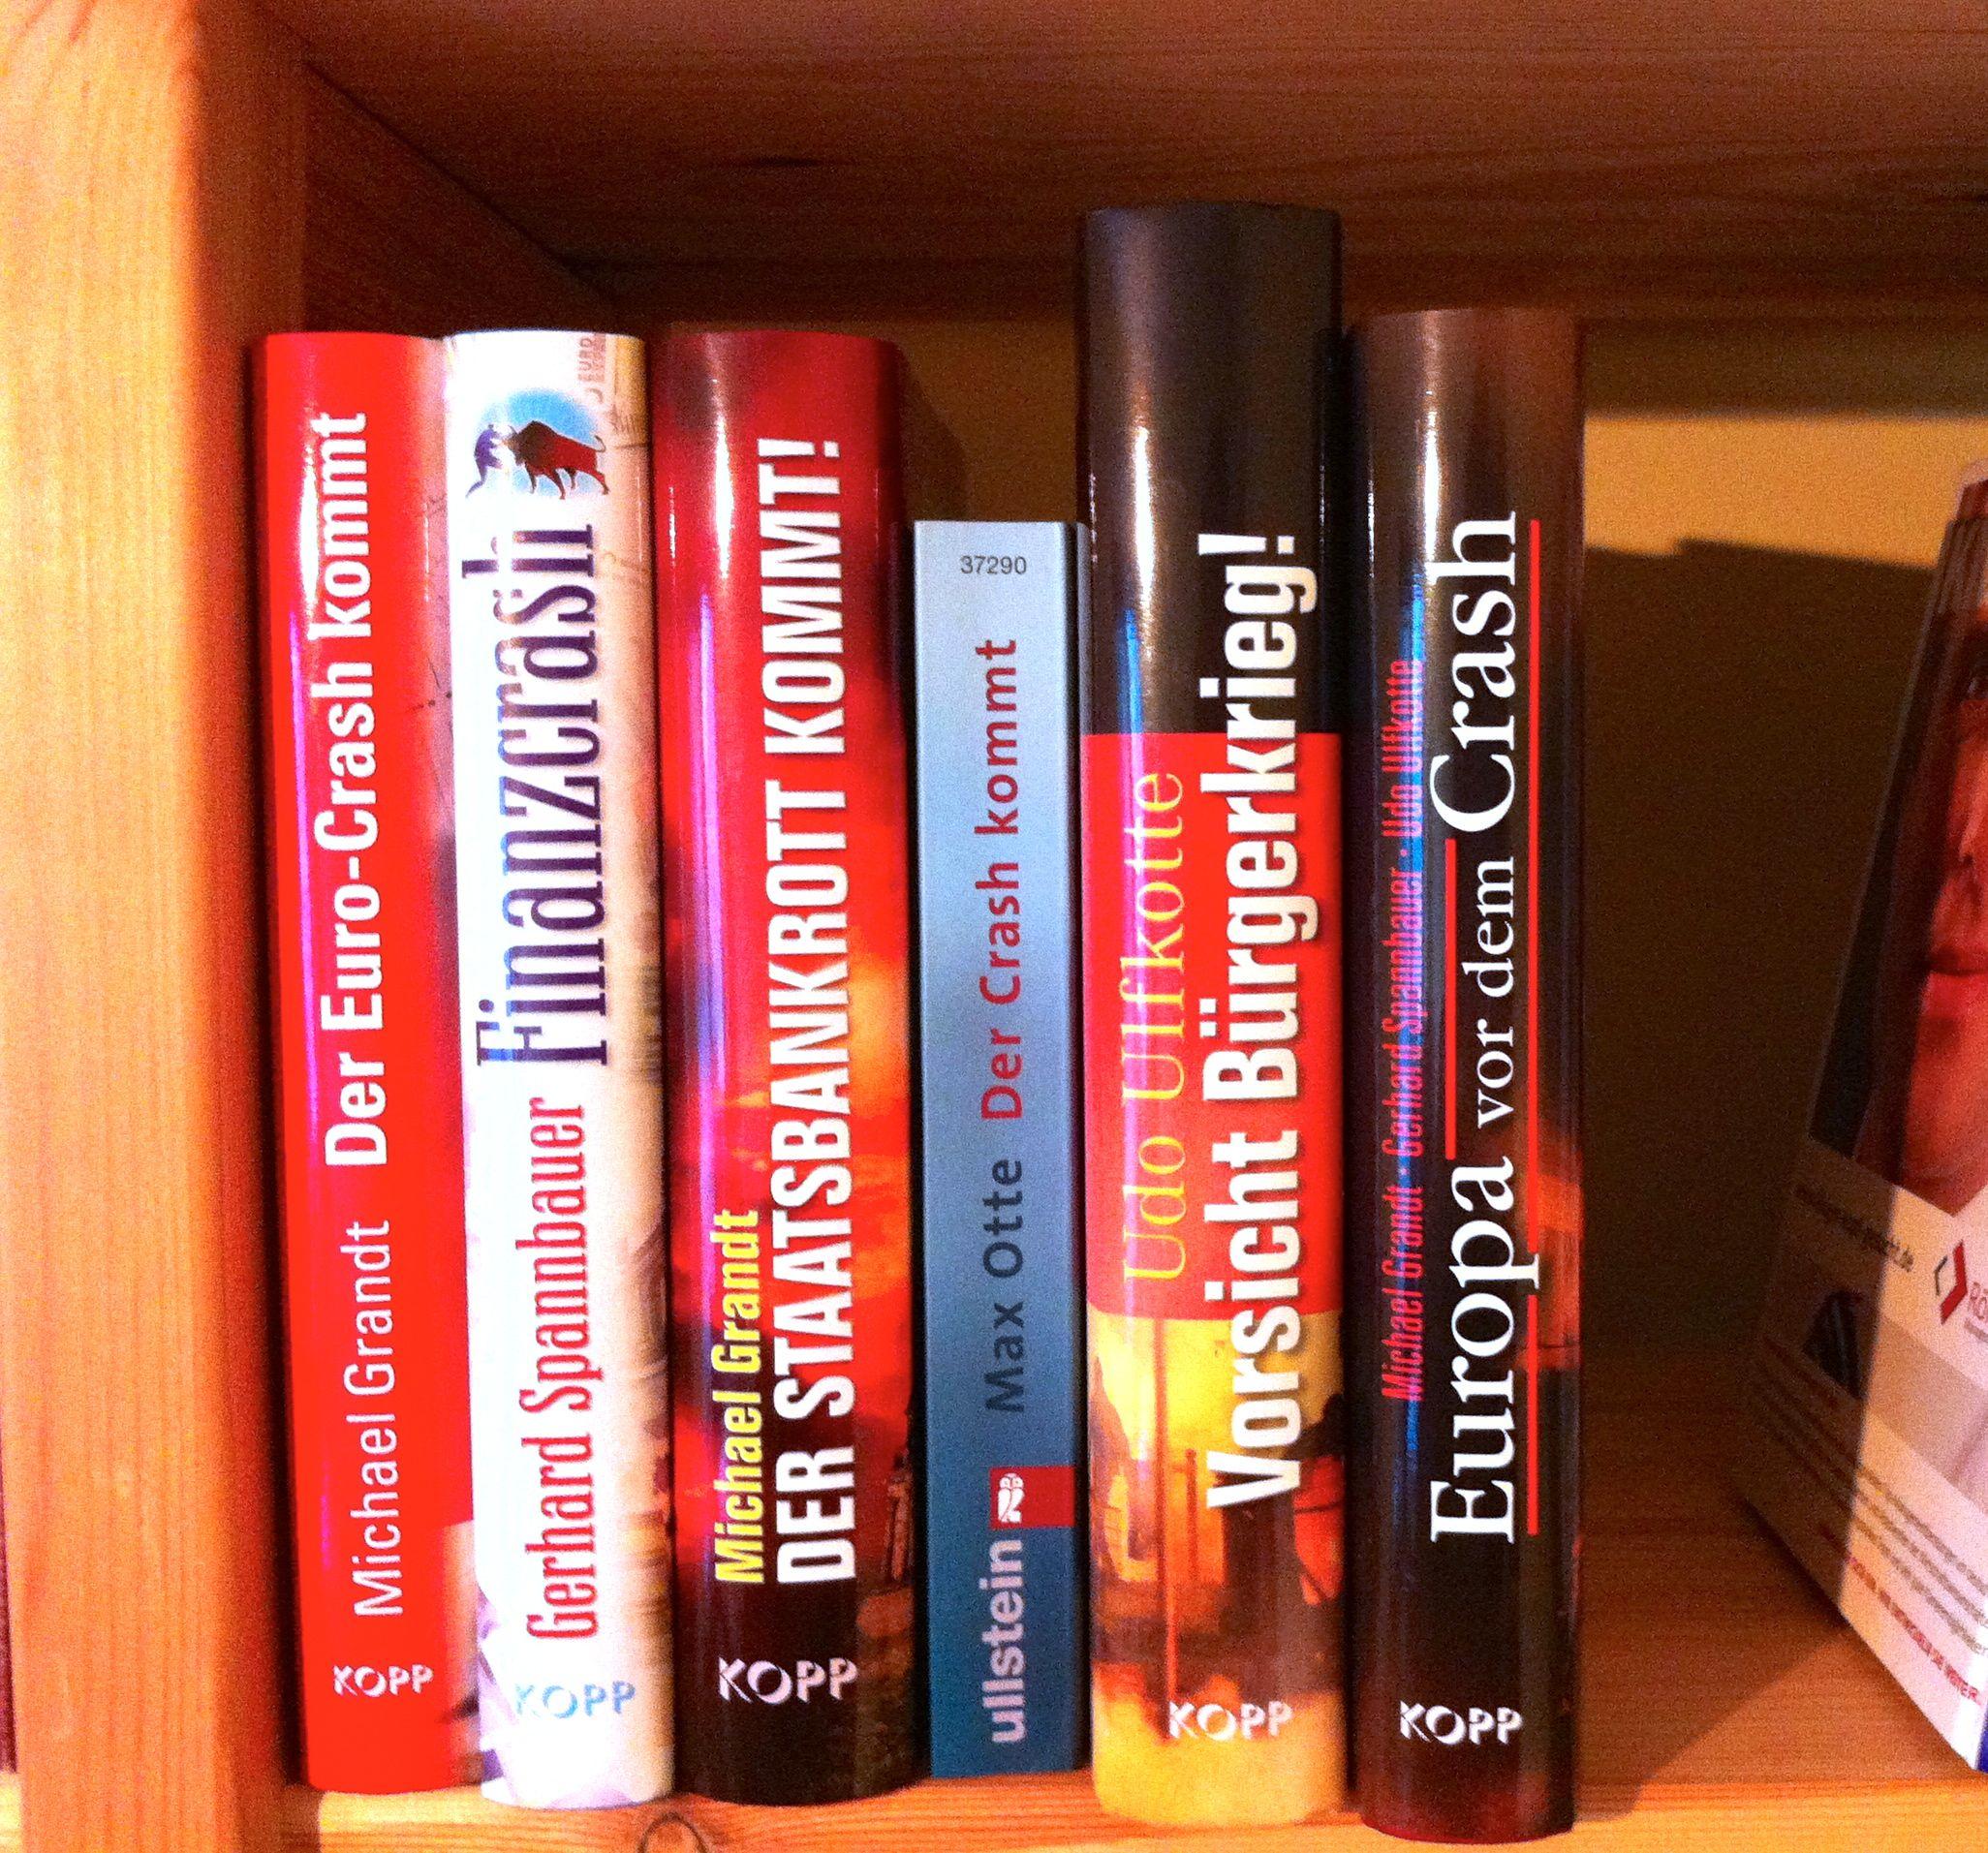 Krisenvorsorge Bücher